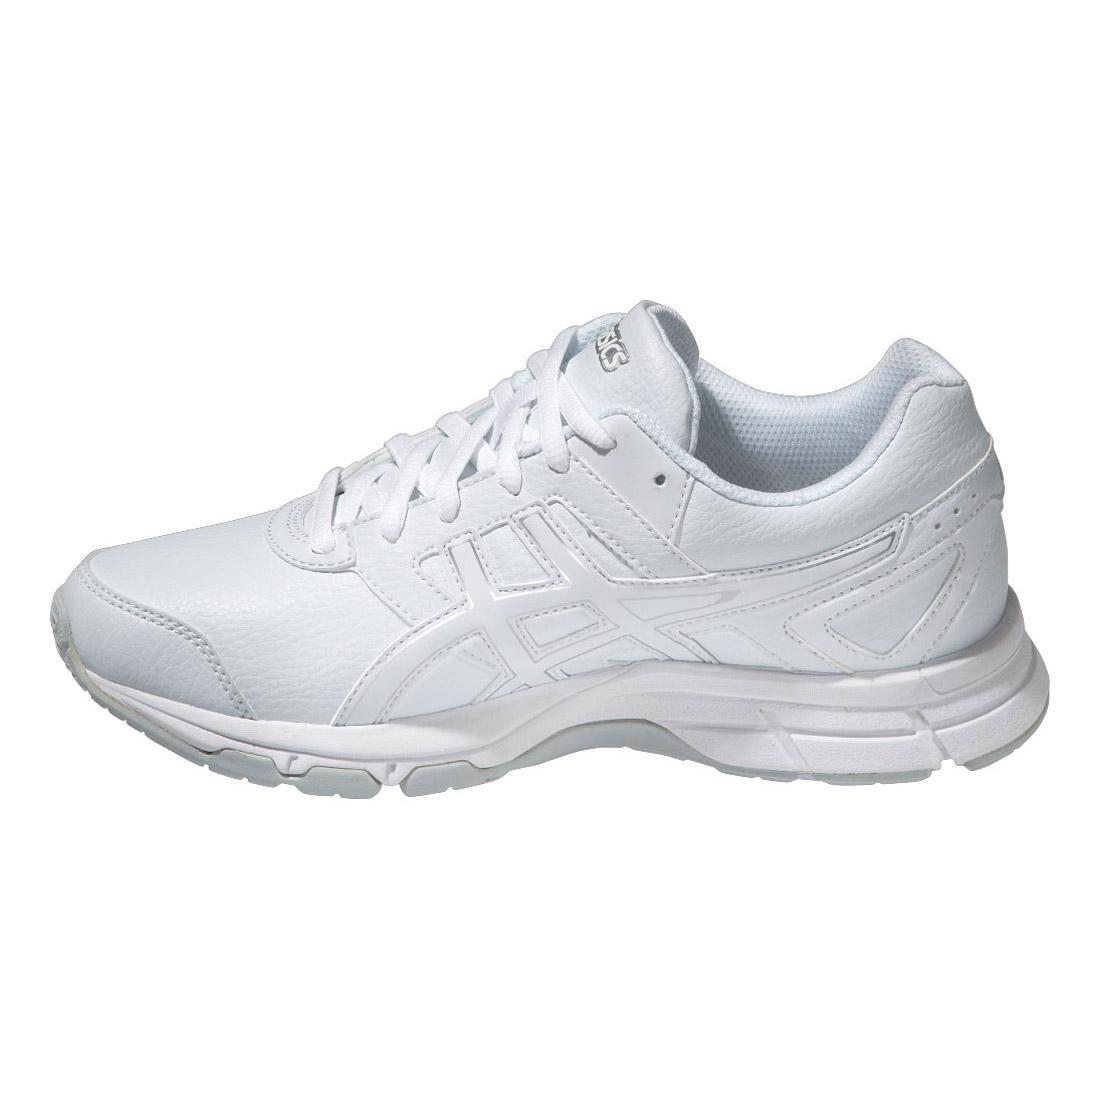 trascorrere ciclo pubblico  Asics Kids GEL-Galaxy 8 GS Running Shoes - White - Tennisnuts.com